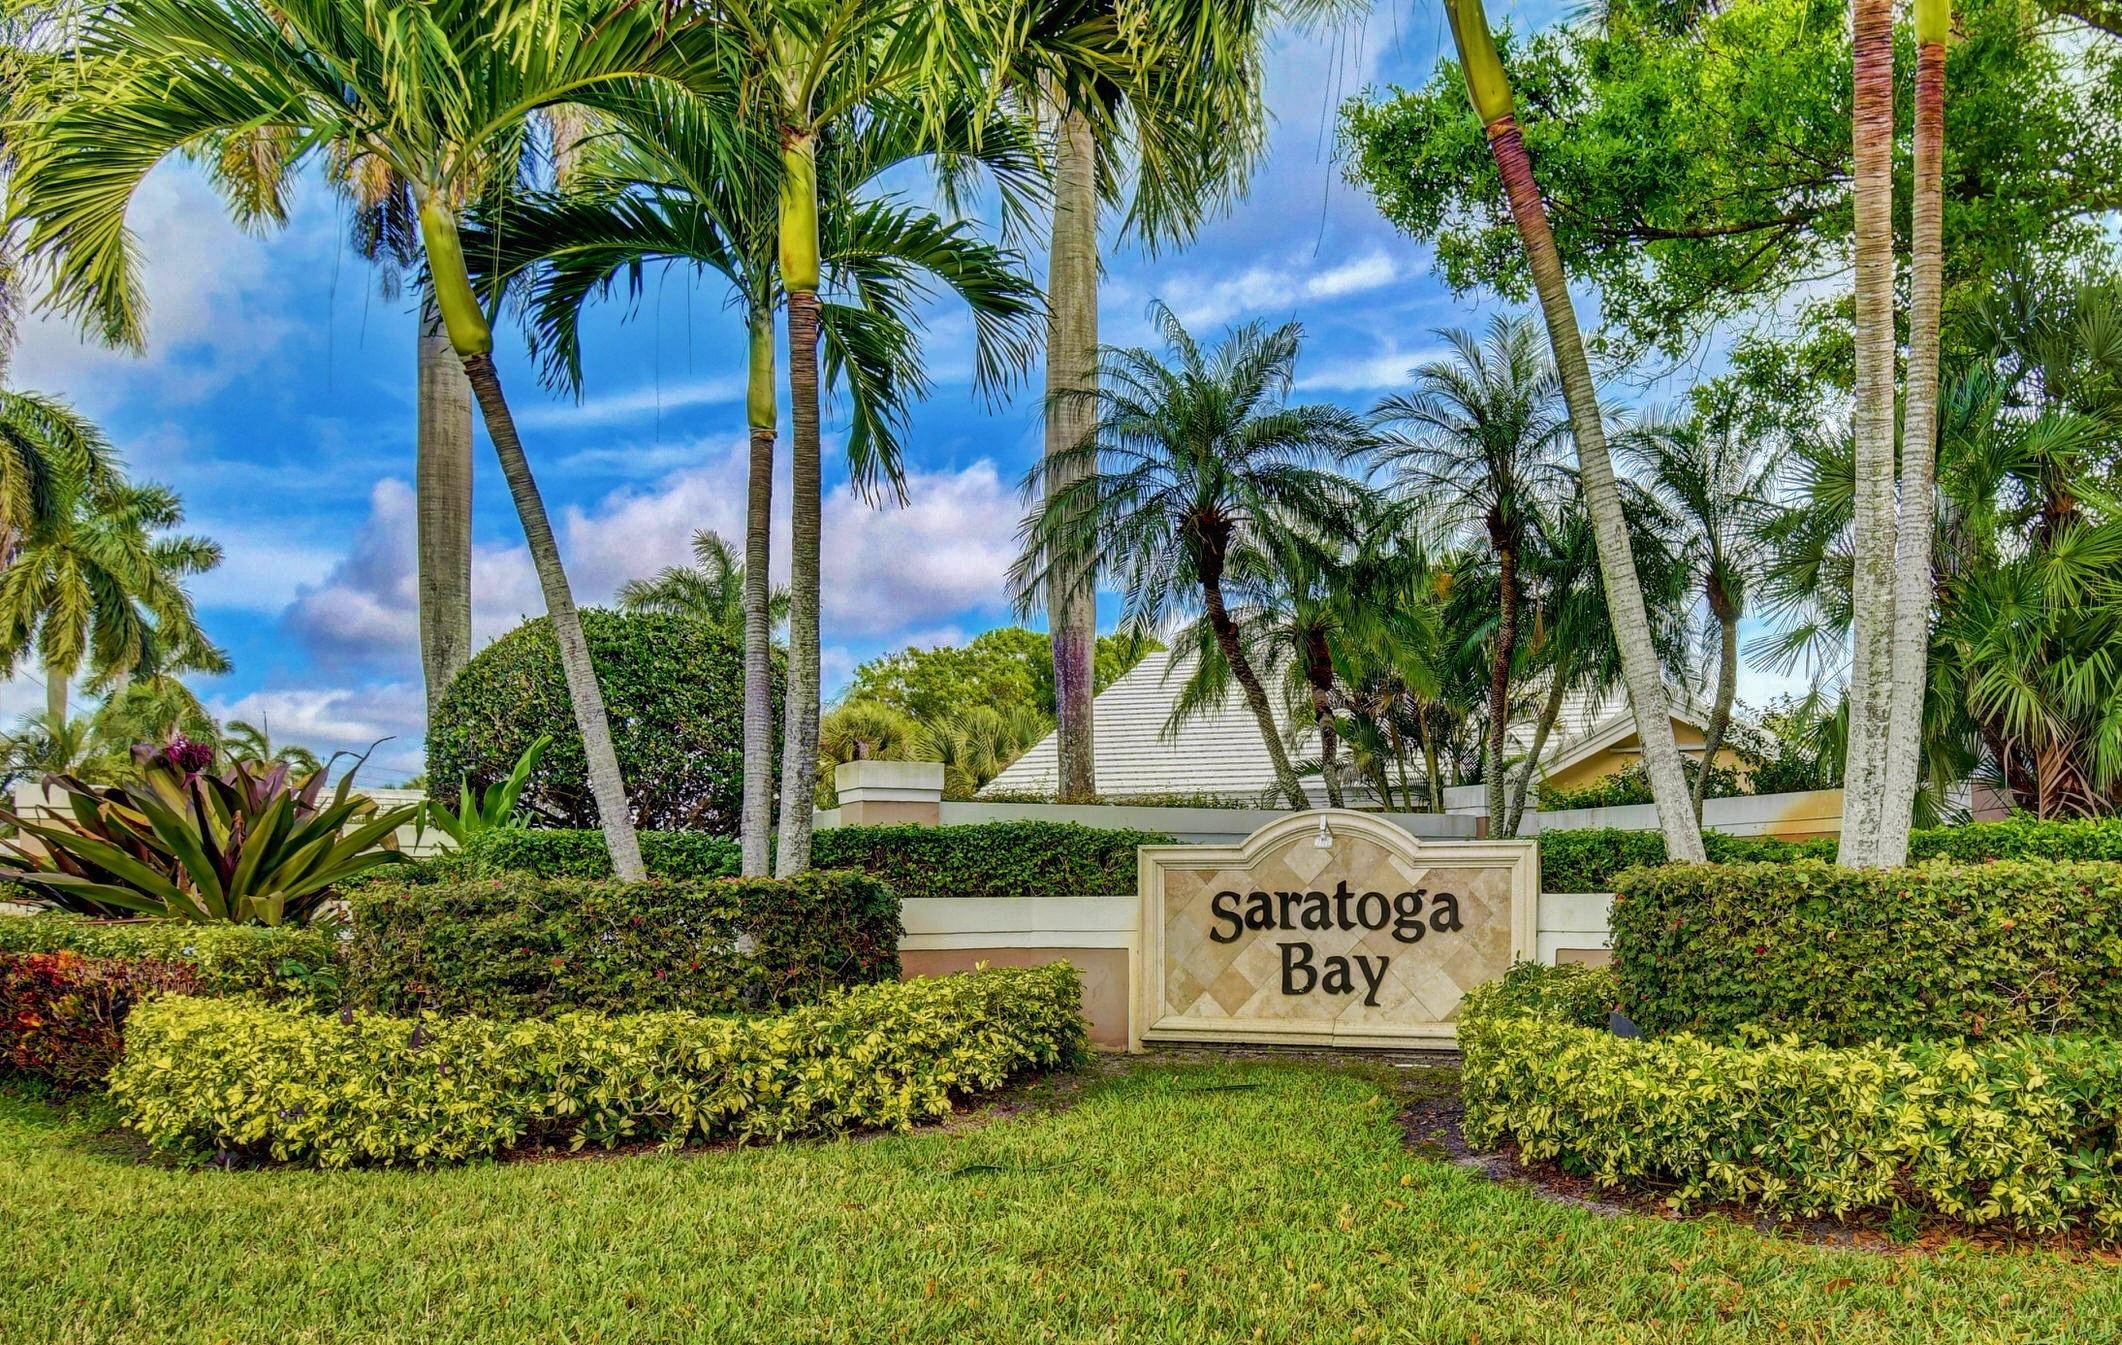 Saratoga Bay Entrance